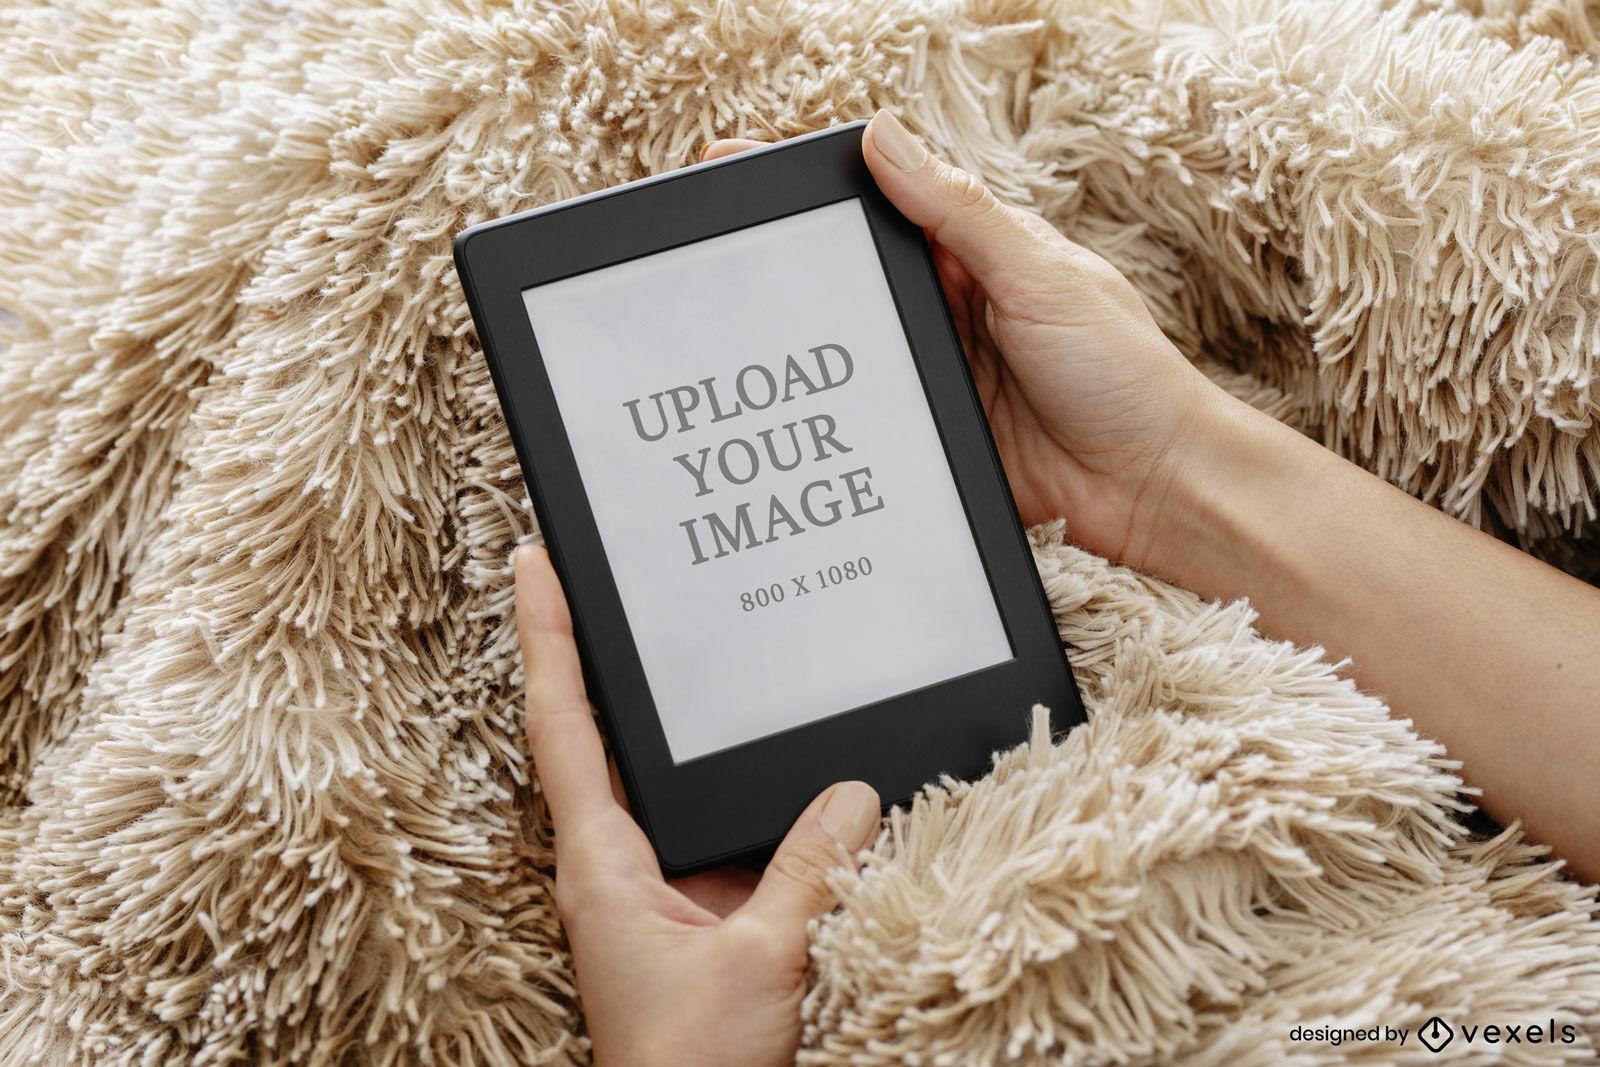 Kindle-Modell Fuzzy-Decke